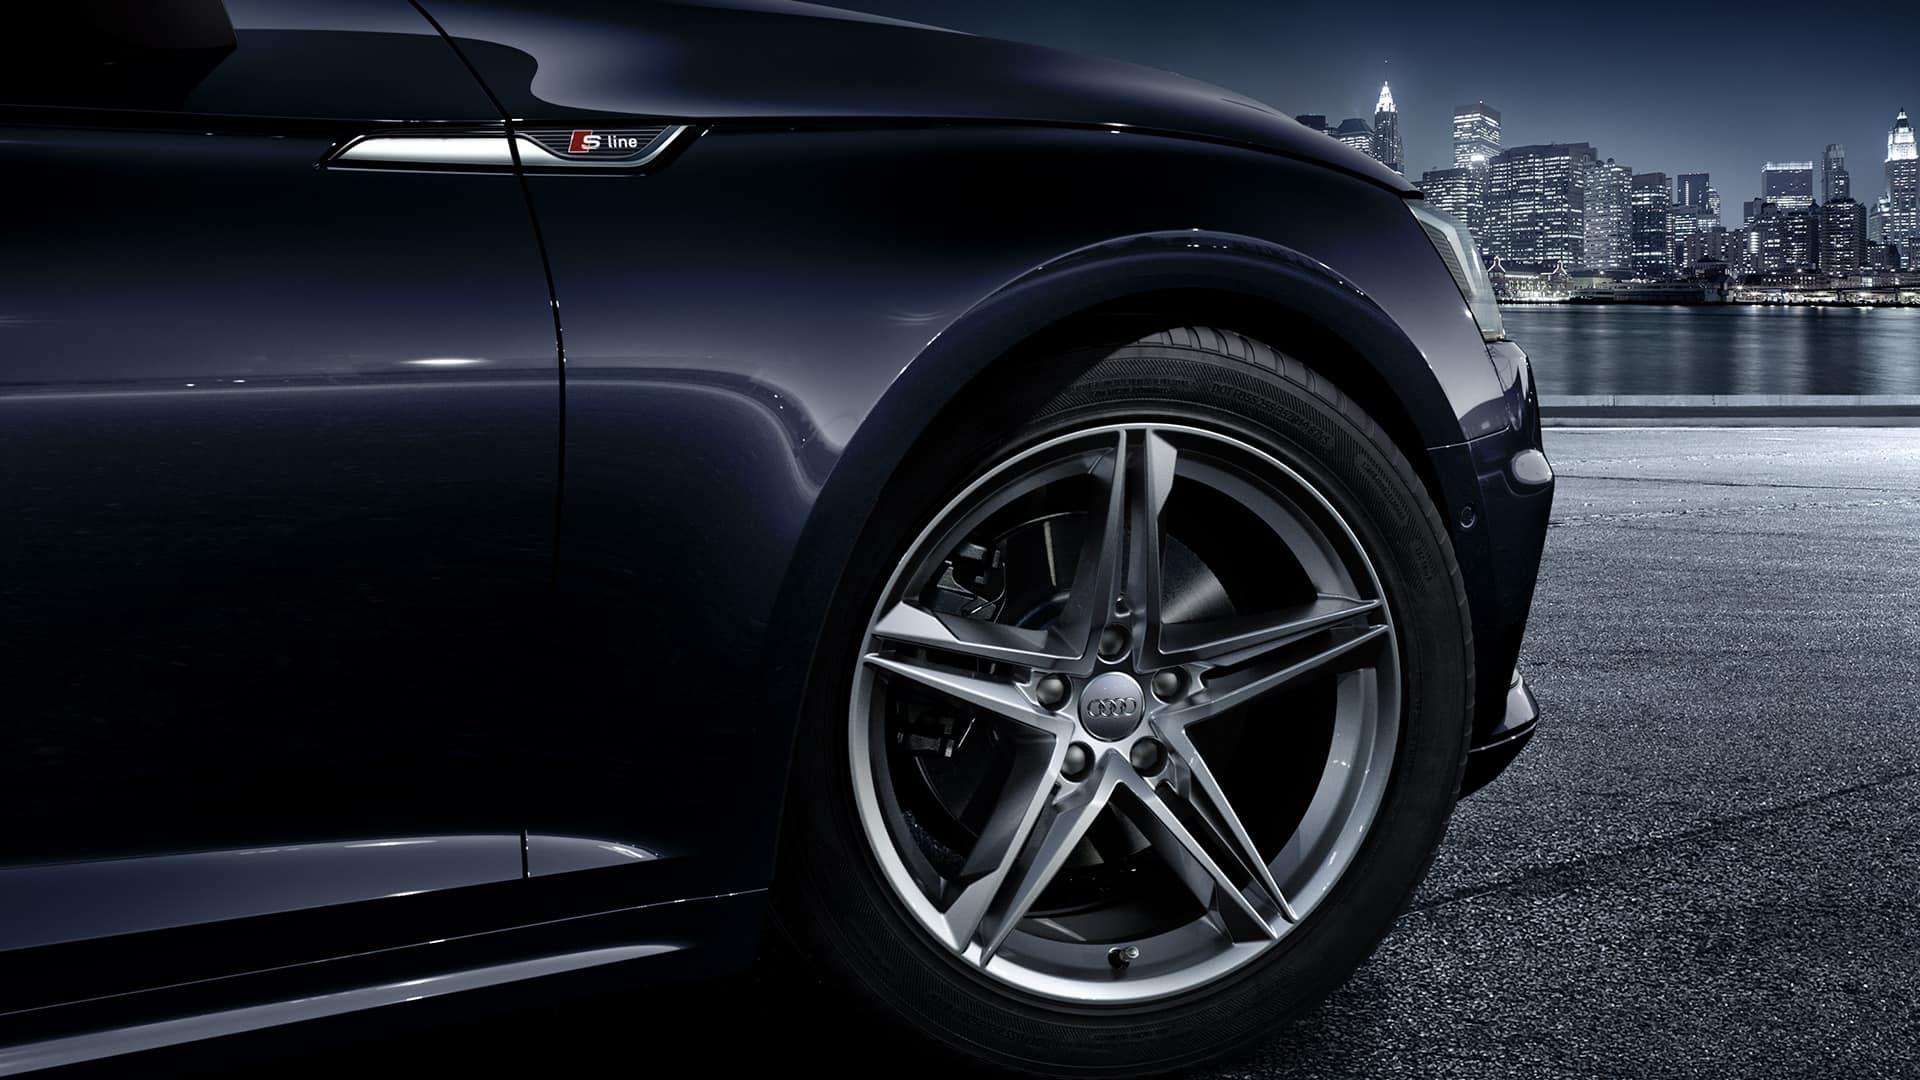 The New A Sportback A Audi India - Audi 5